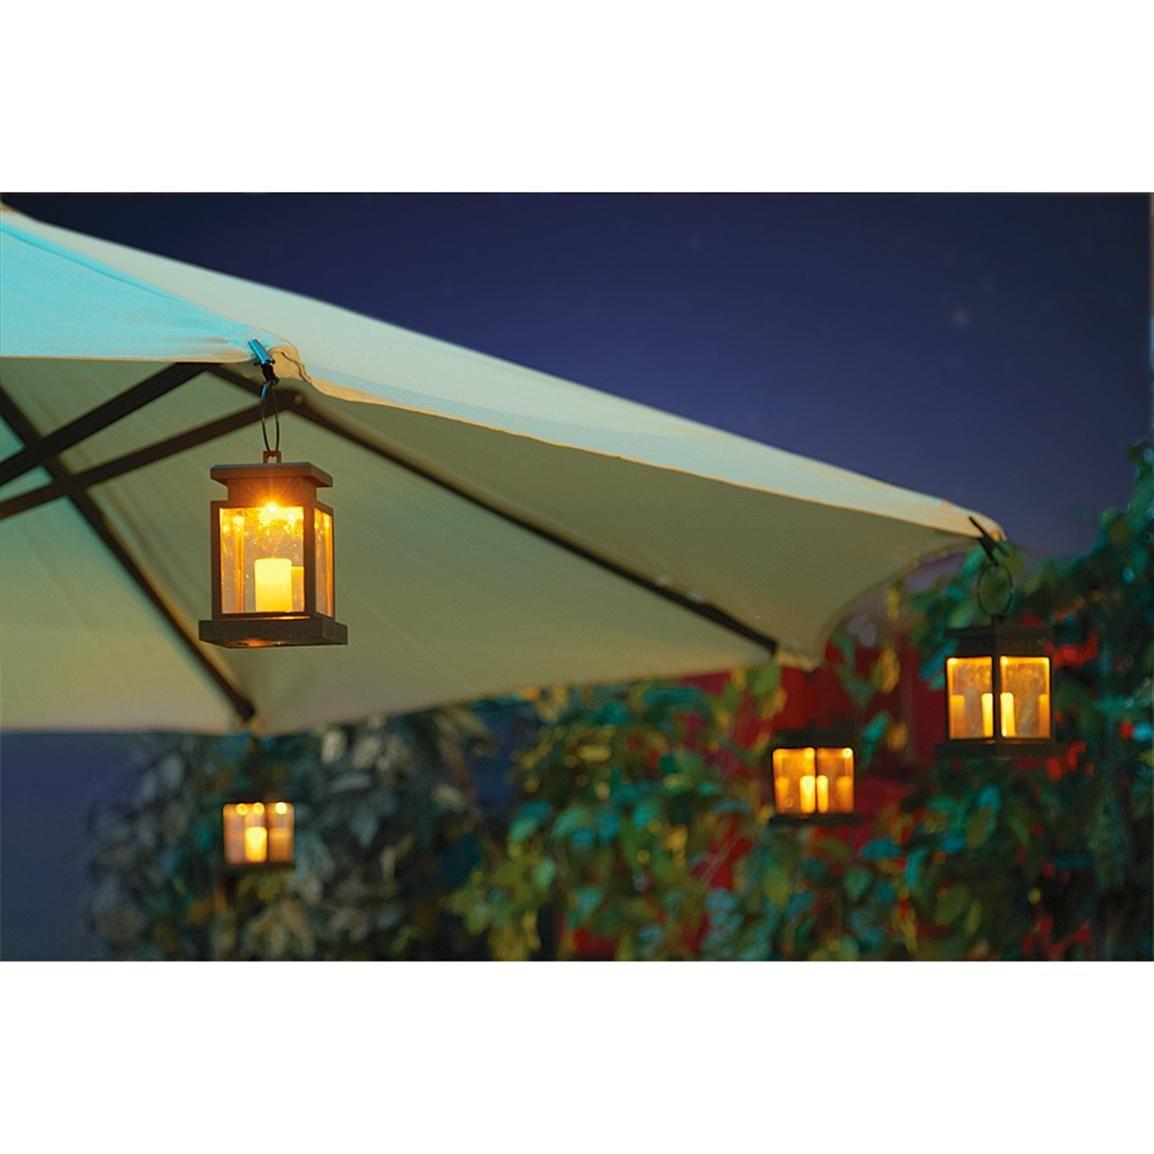 4 Pk Of Solar Patio Umbrella Clip Lights Outdoor Umbrella Lights Patio Umbrella Lights Patio Umbrella